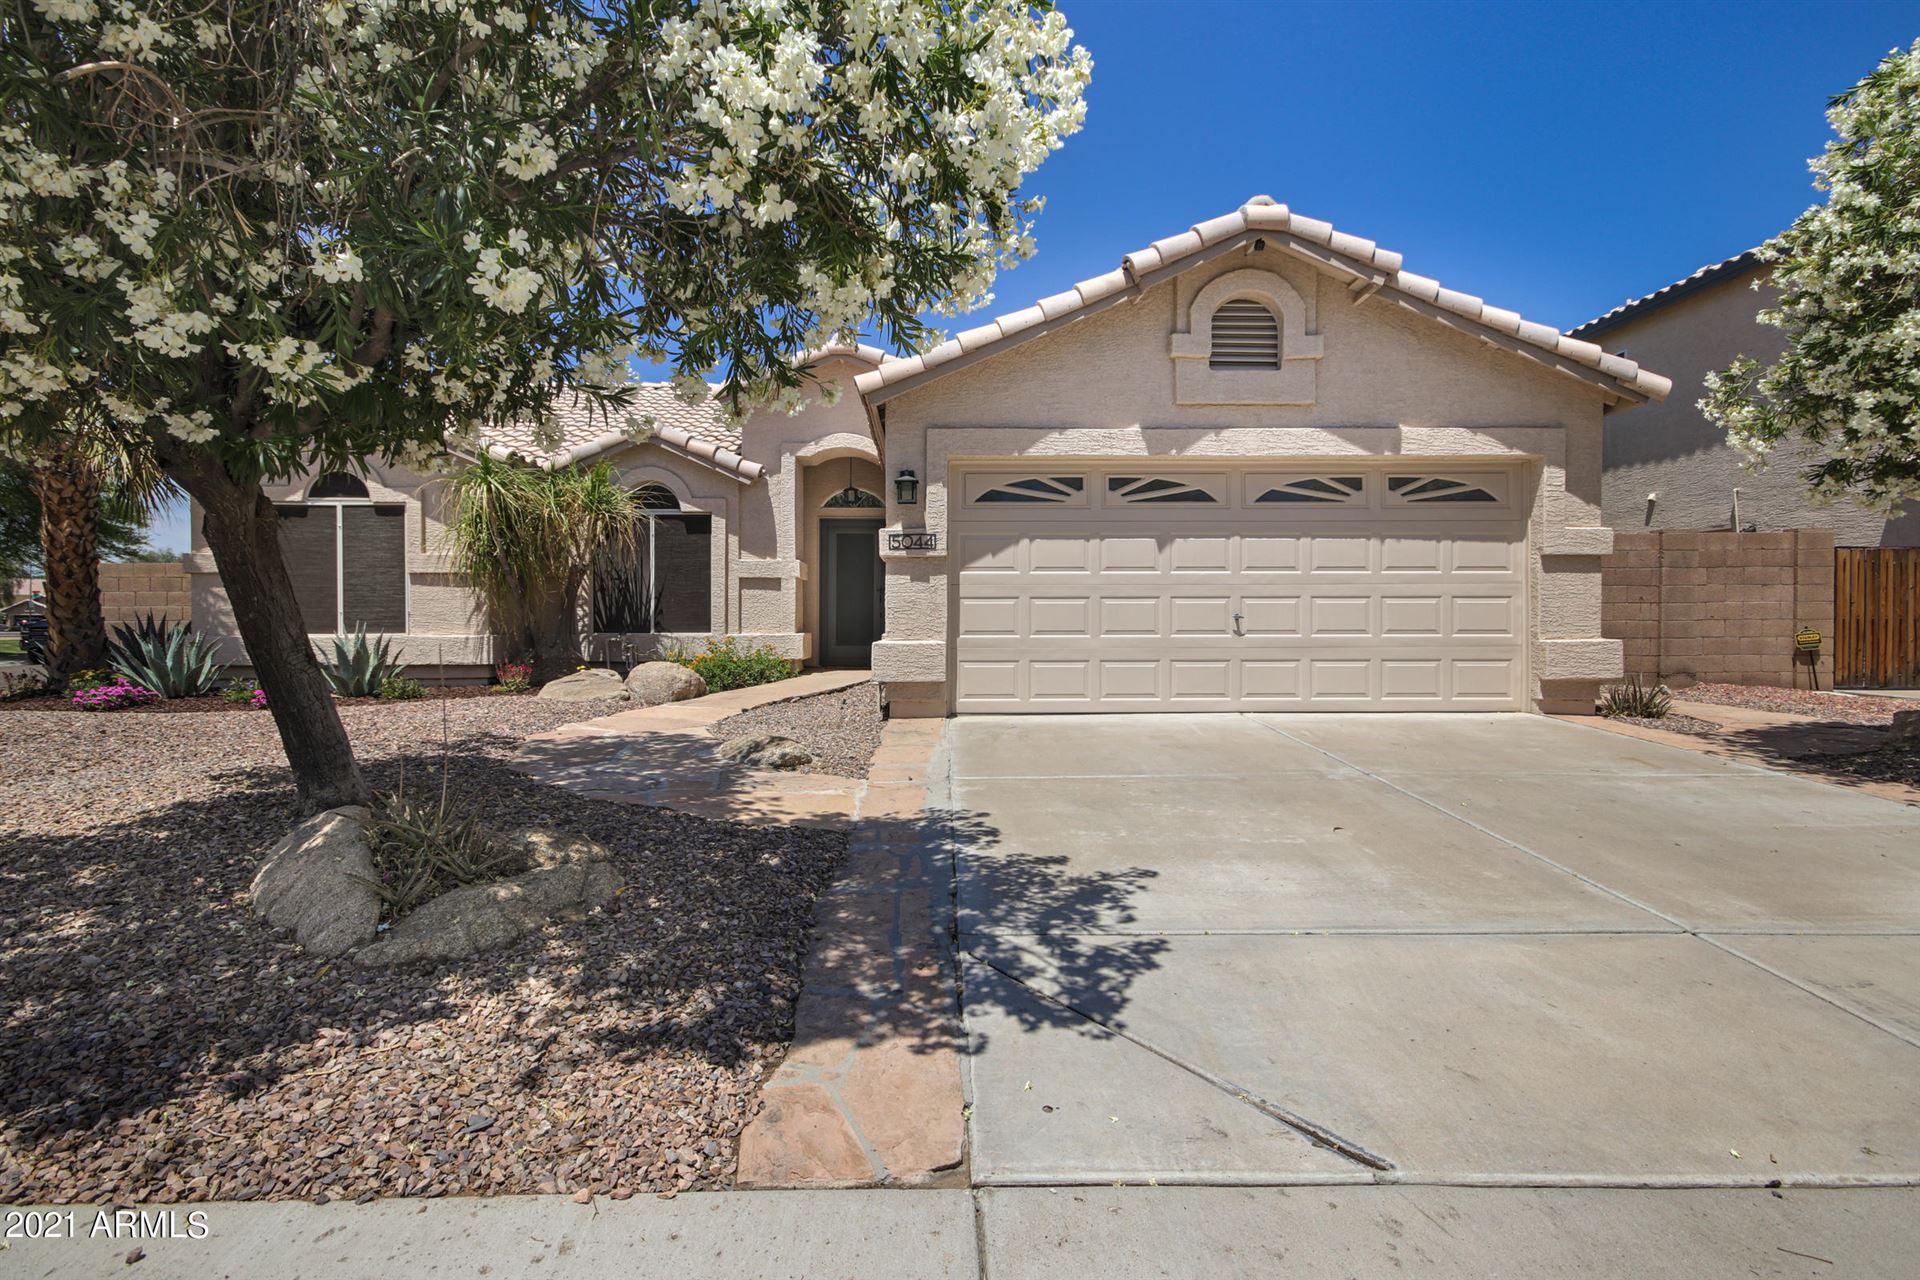 Photo of 5044 W TARO Drive, Glendale, AZ 85308 (MLS # 6234537)